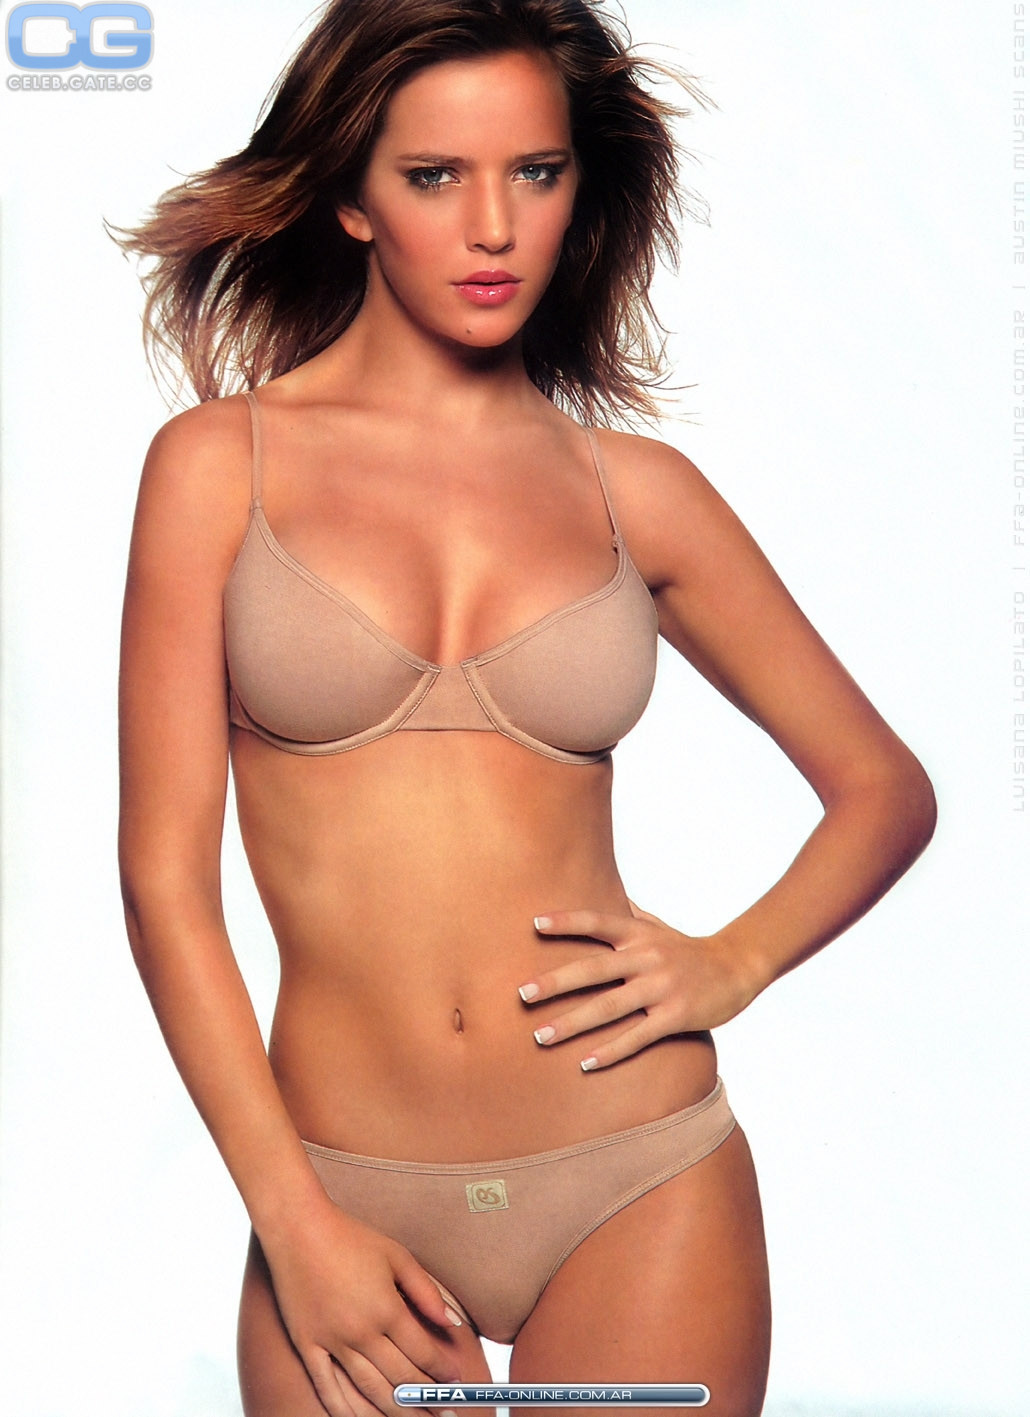 Lopilato nackt Luisana  Michael Bublé's